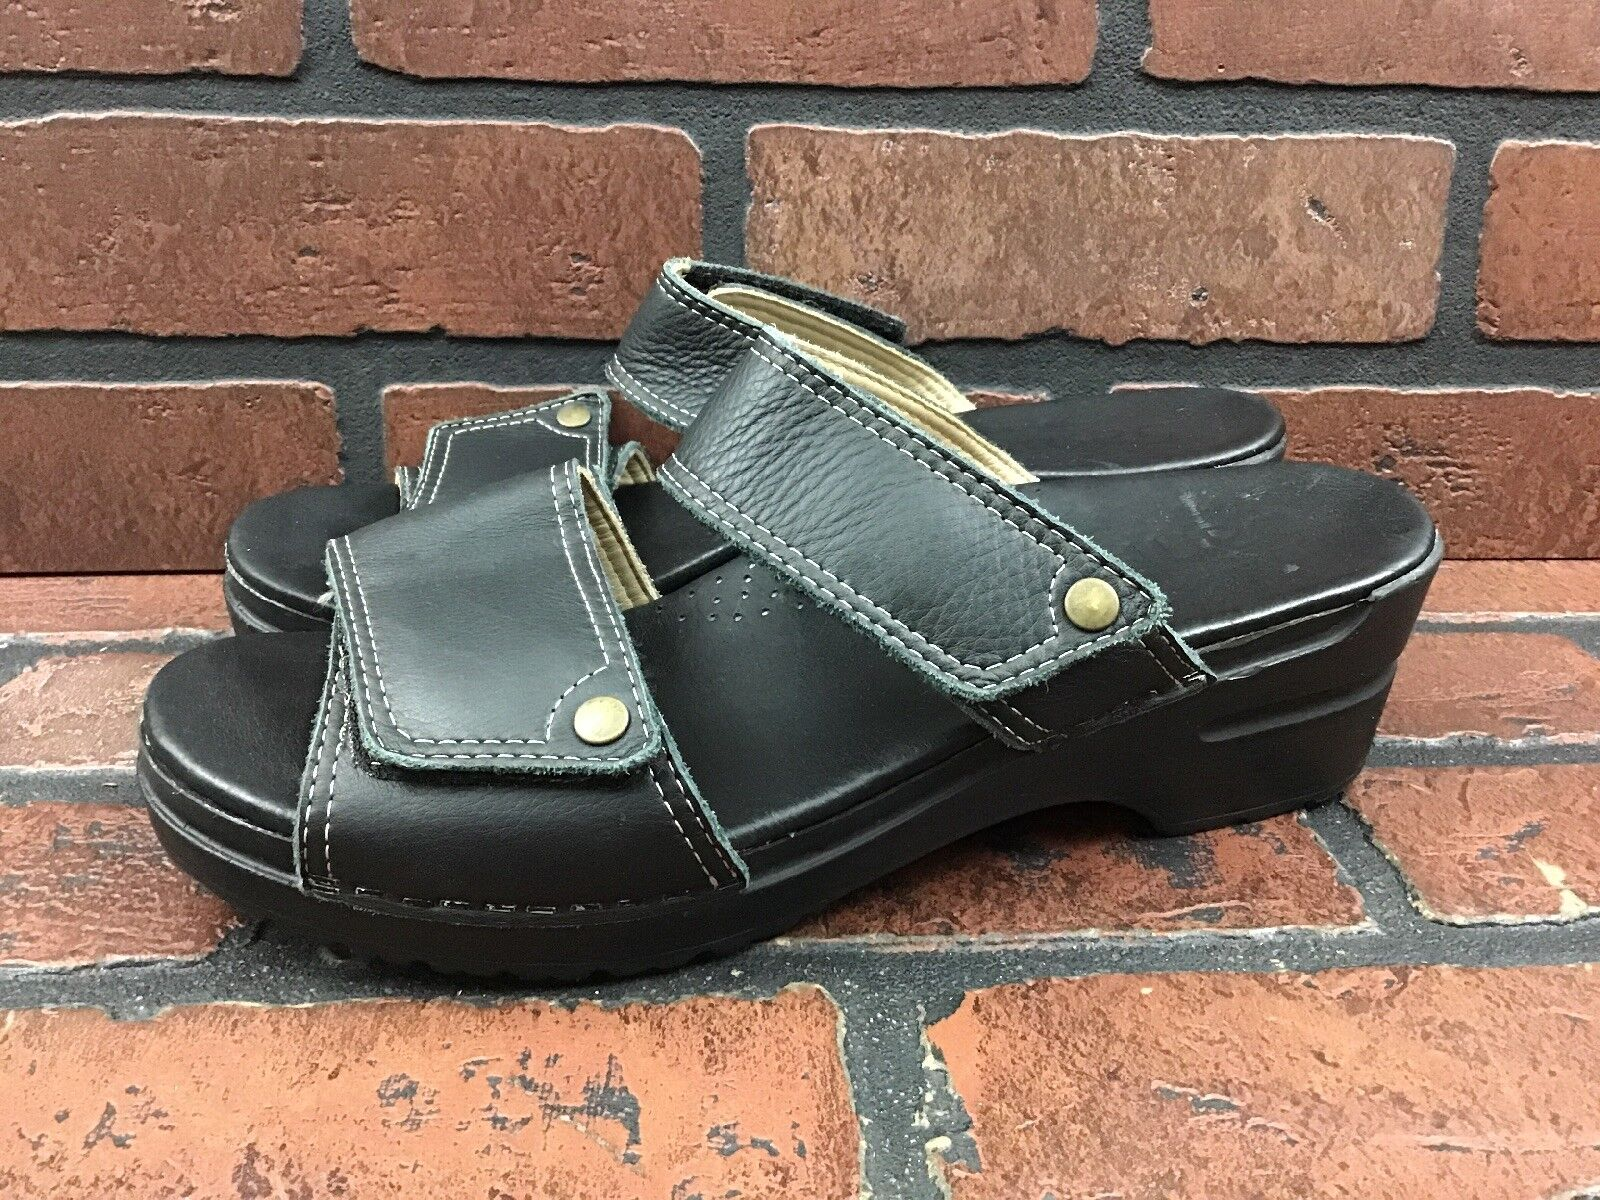 SANITA Black Leather 2 Strap Adjustable Slip-On Clogs Sandals EU 40 US 9.5